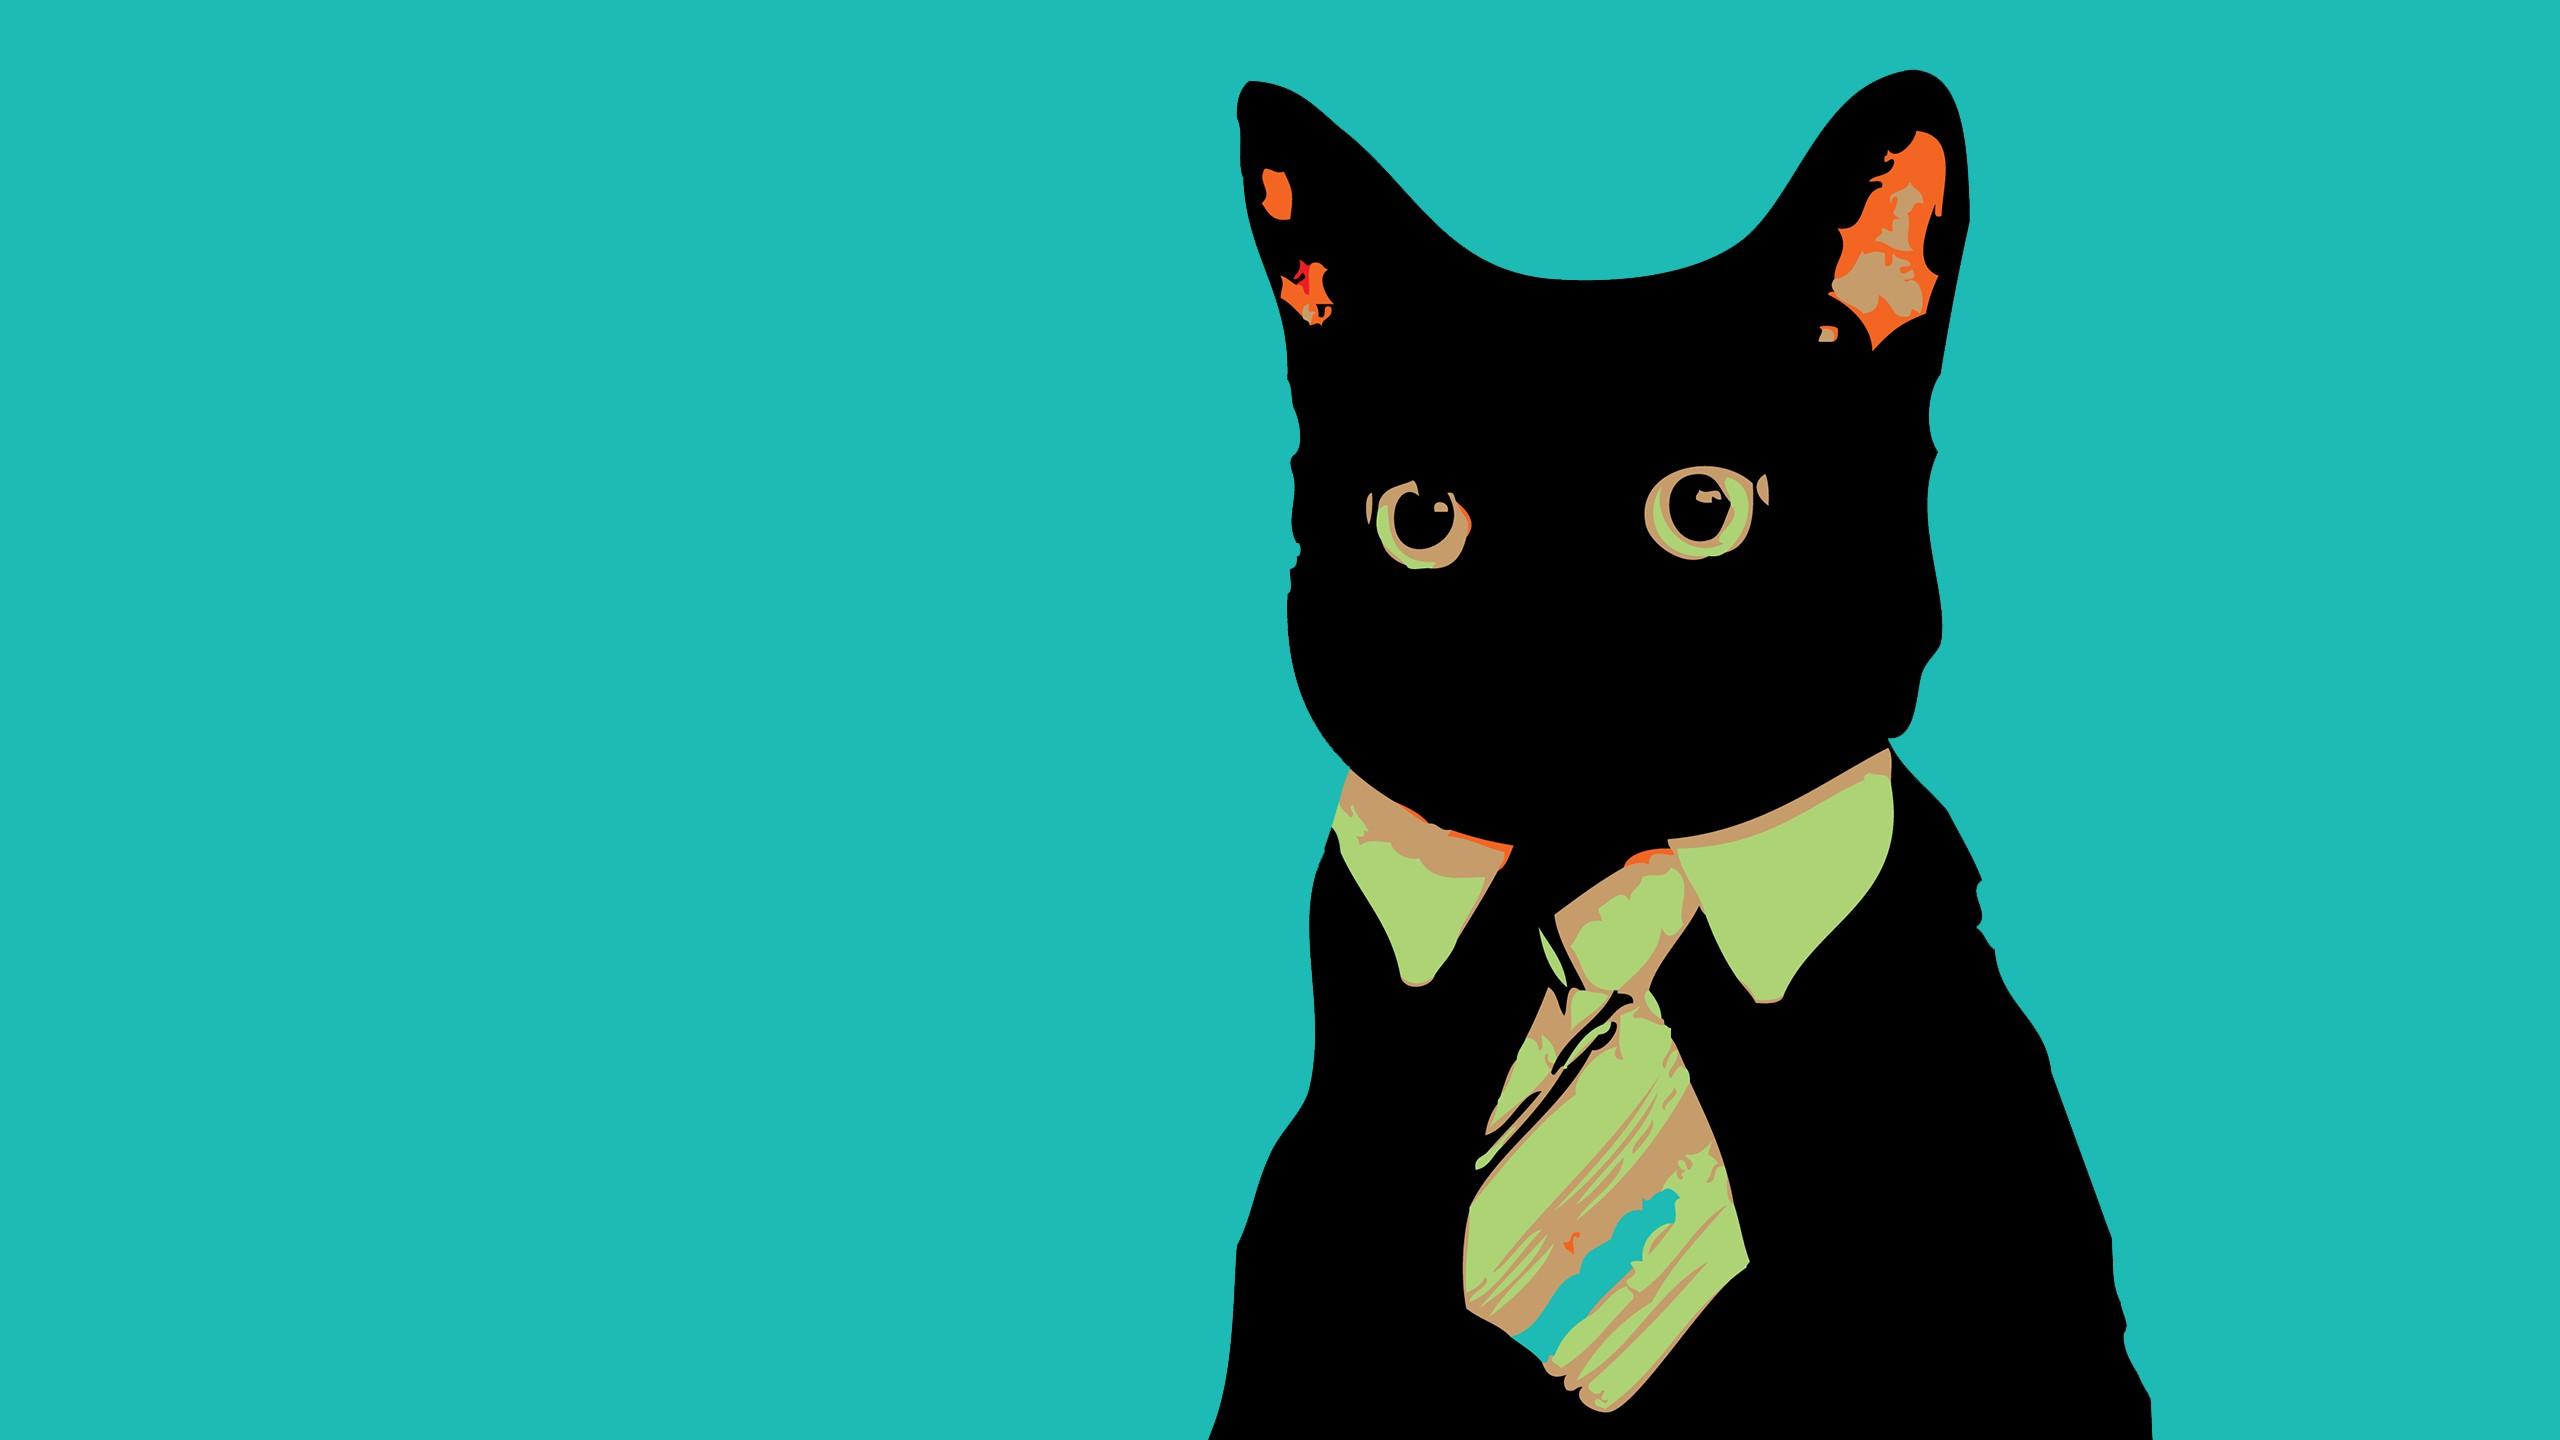 cat meme wallpaper background 64263